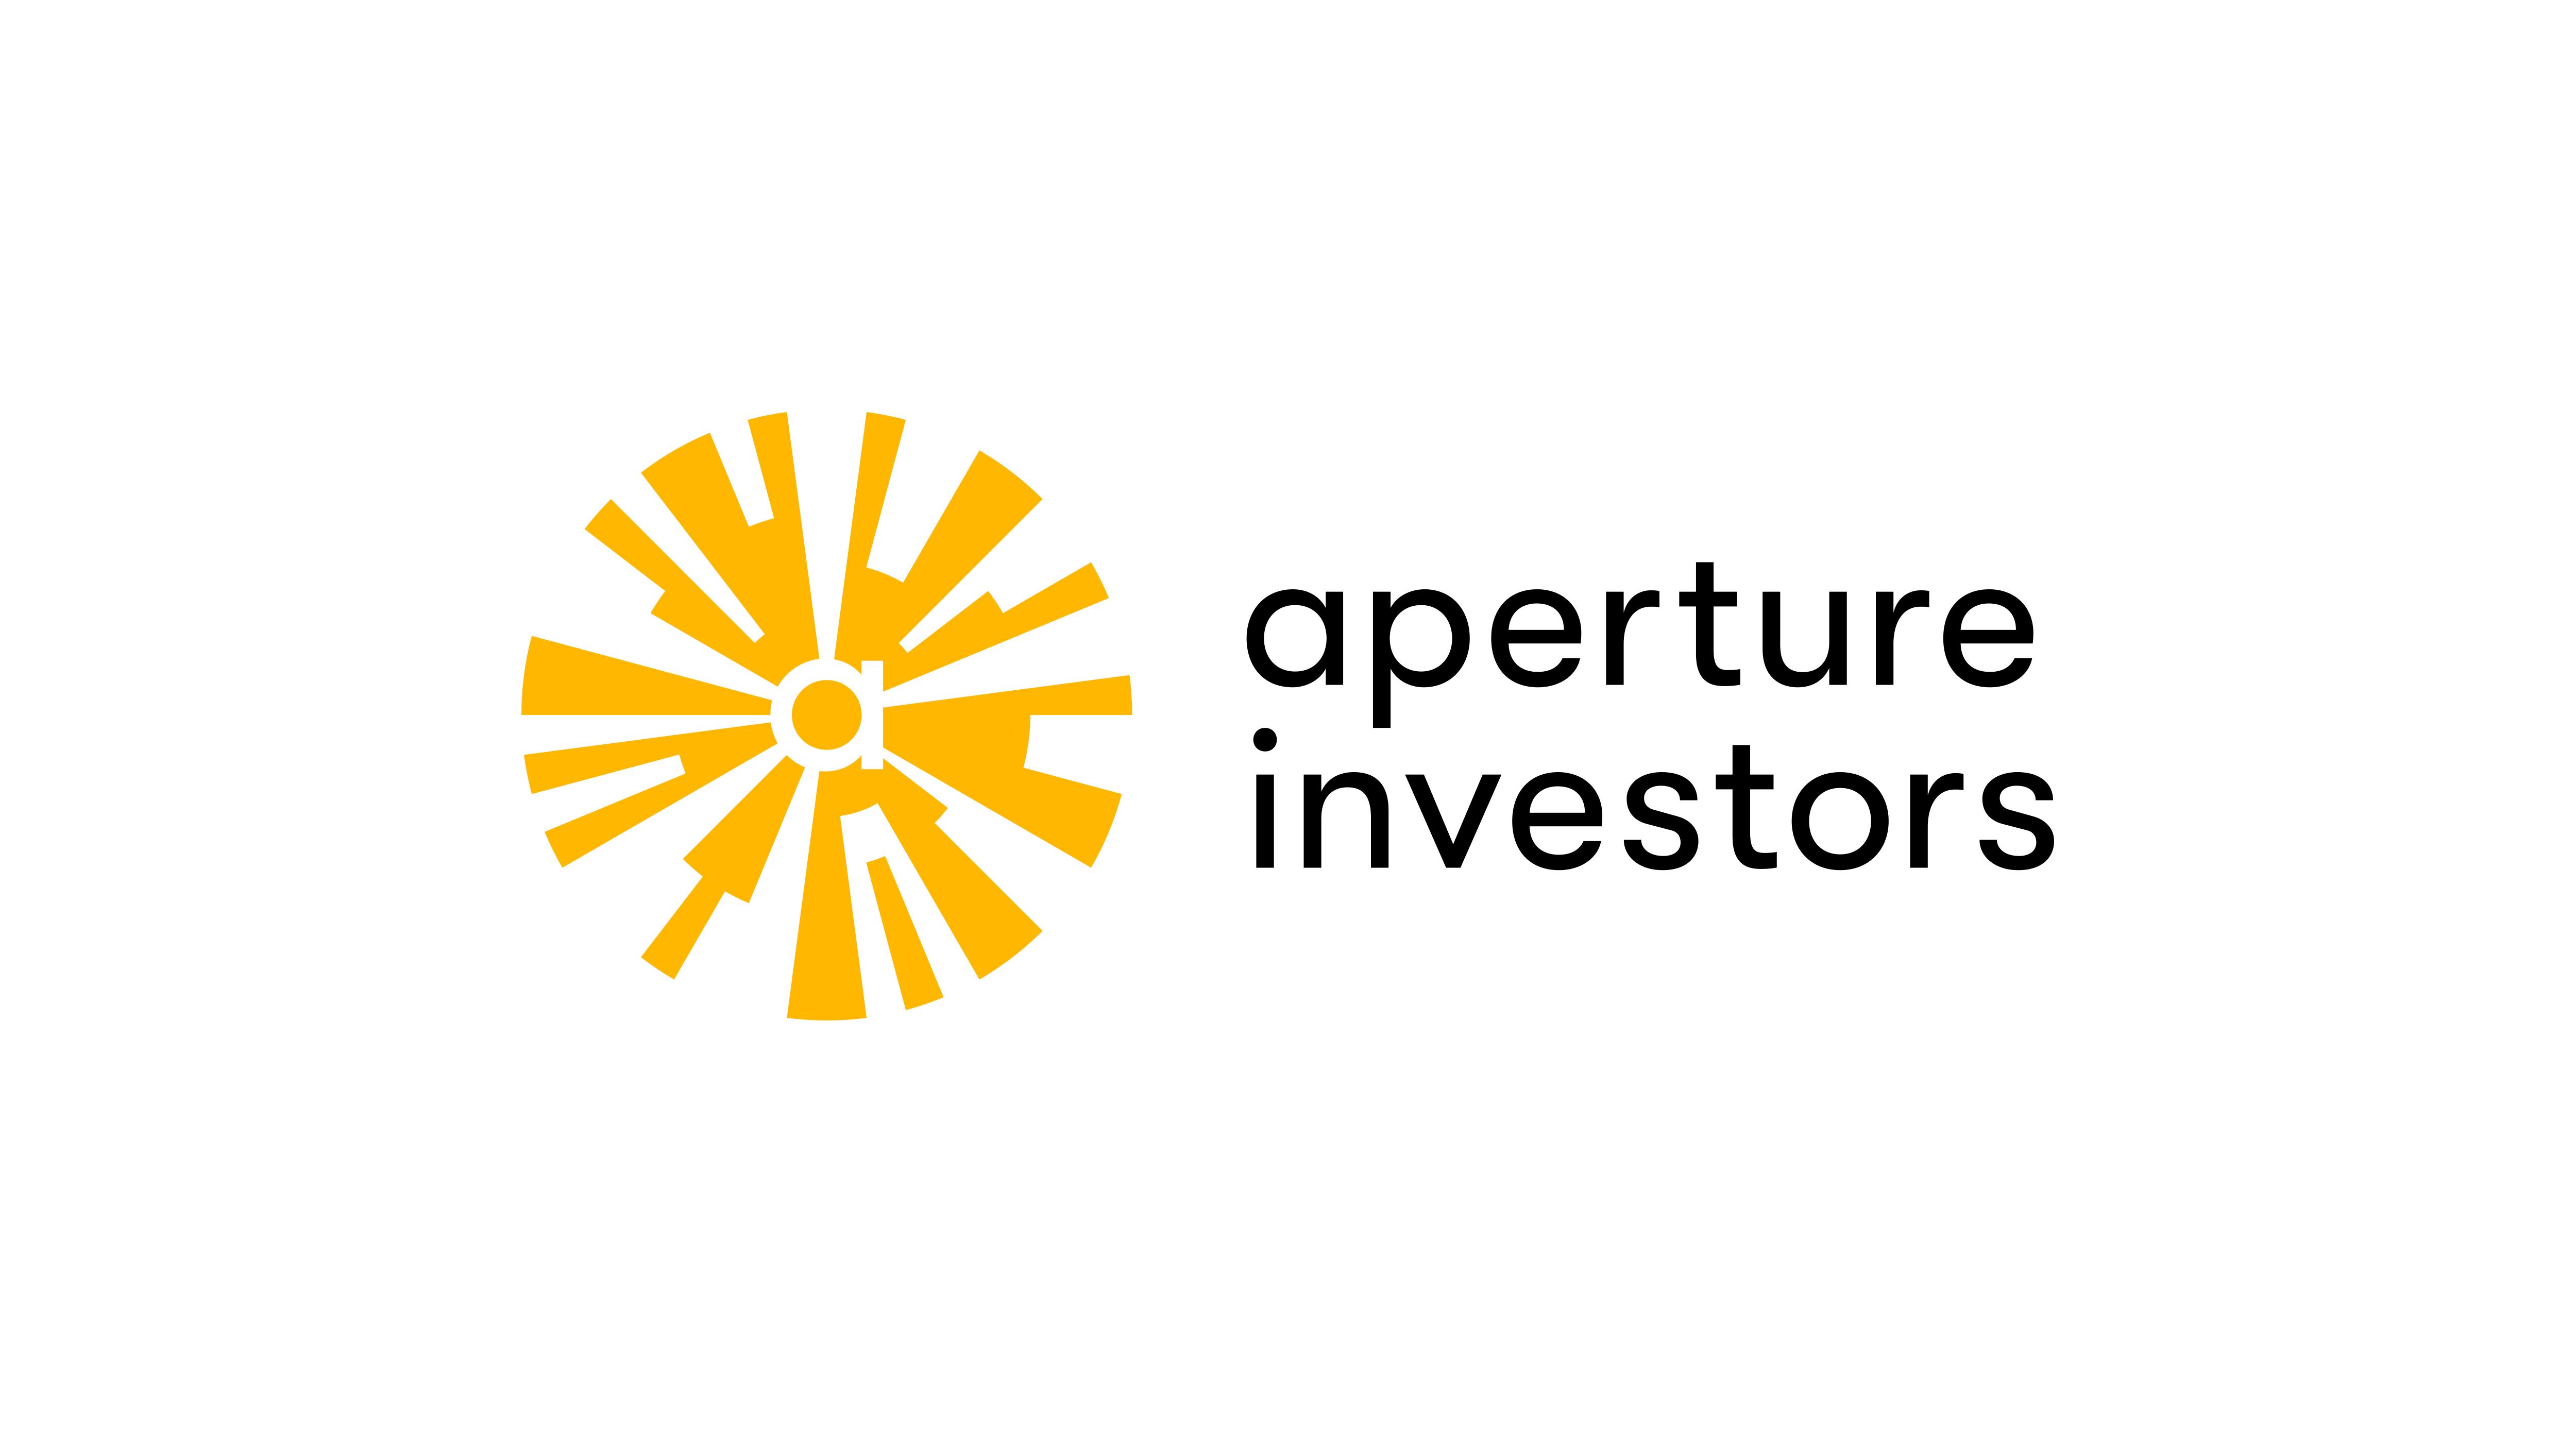 Aperture Investors Branding